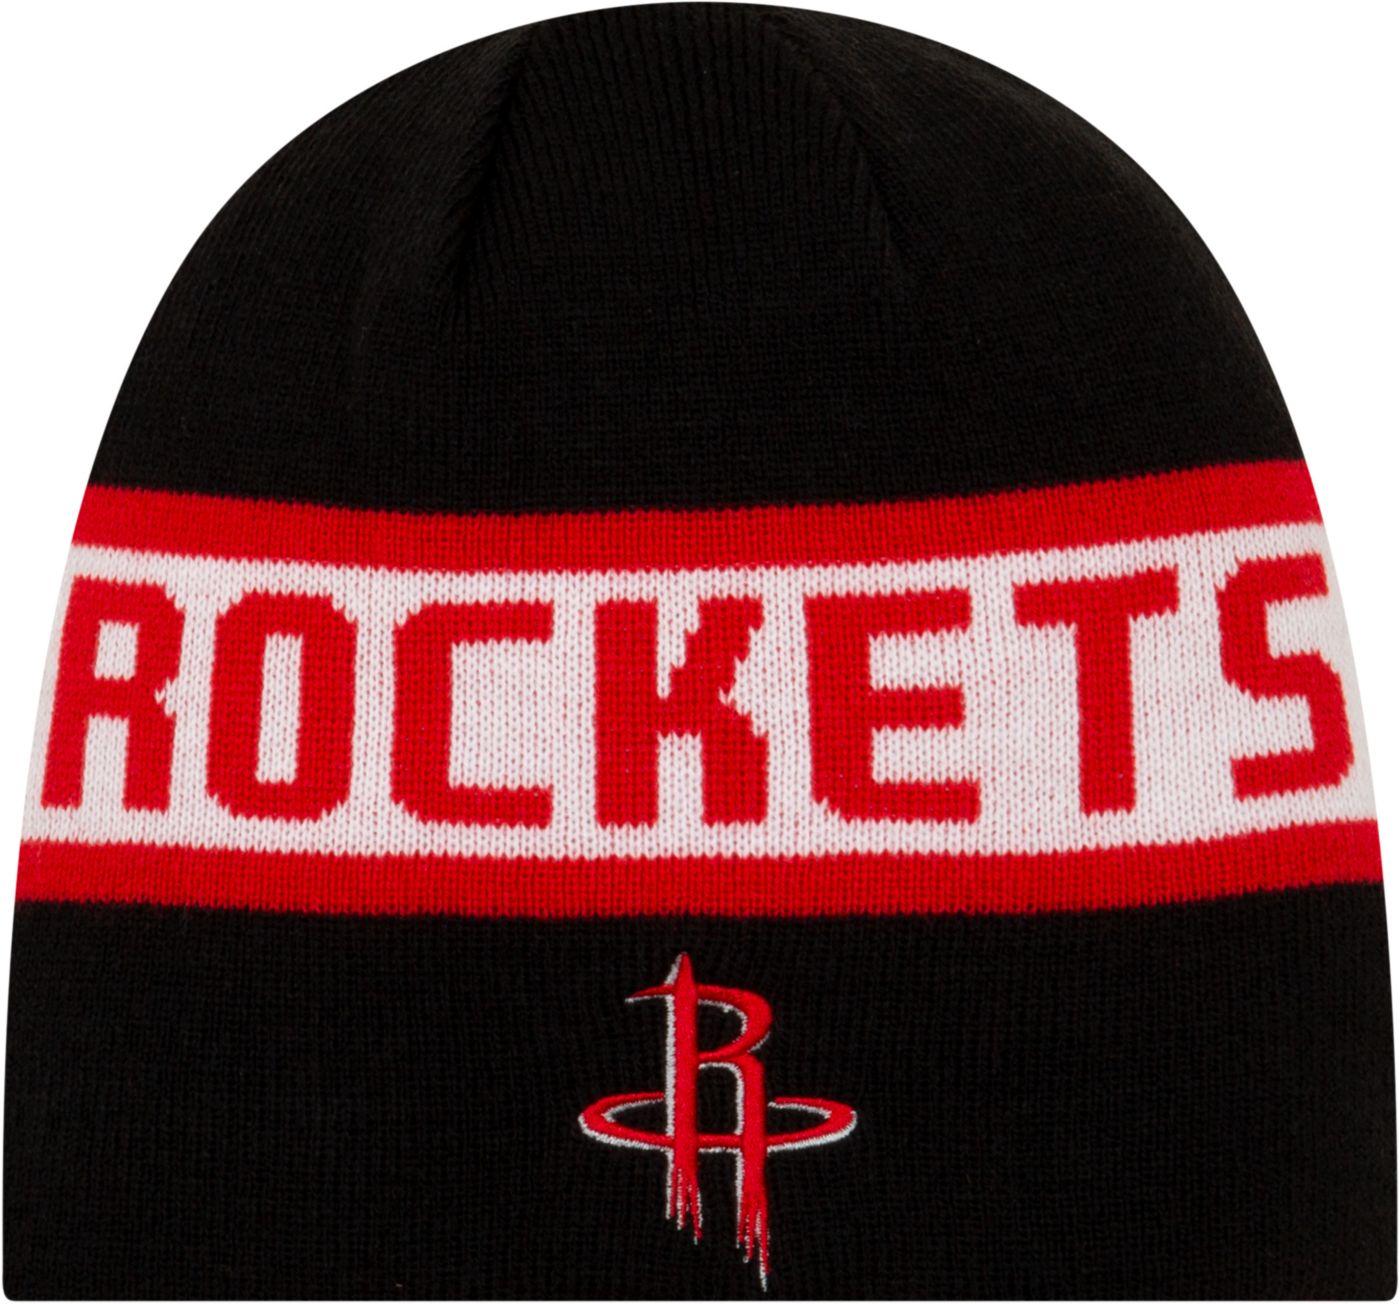 New Era Men's Houston Rockets Reversible Sports Knit Hat